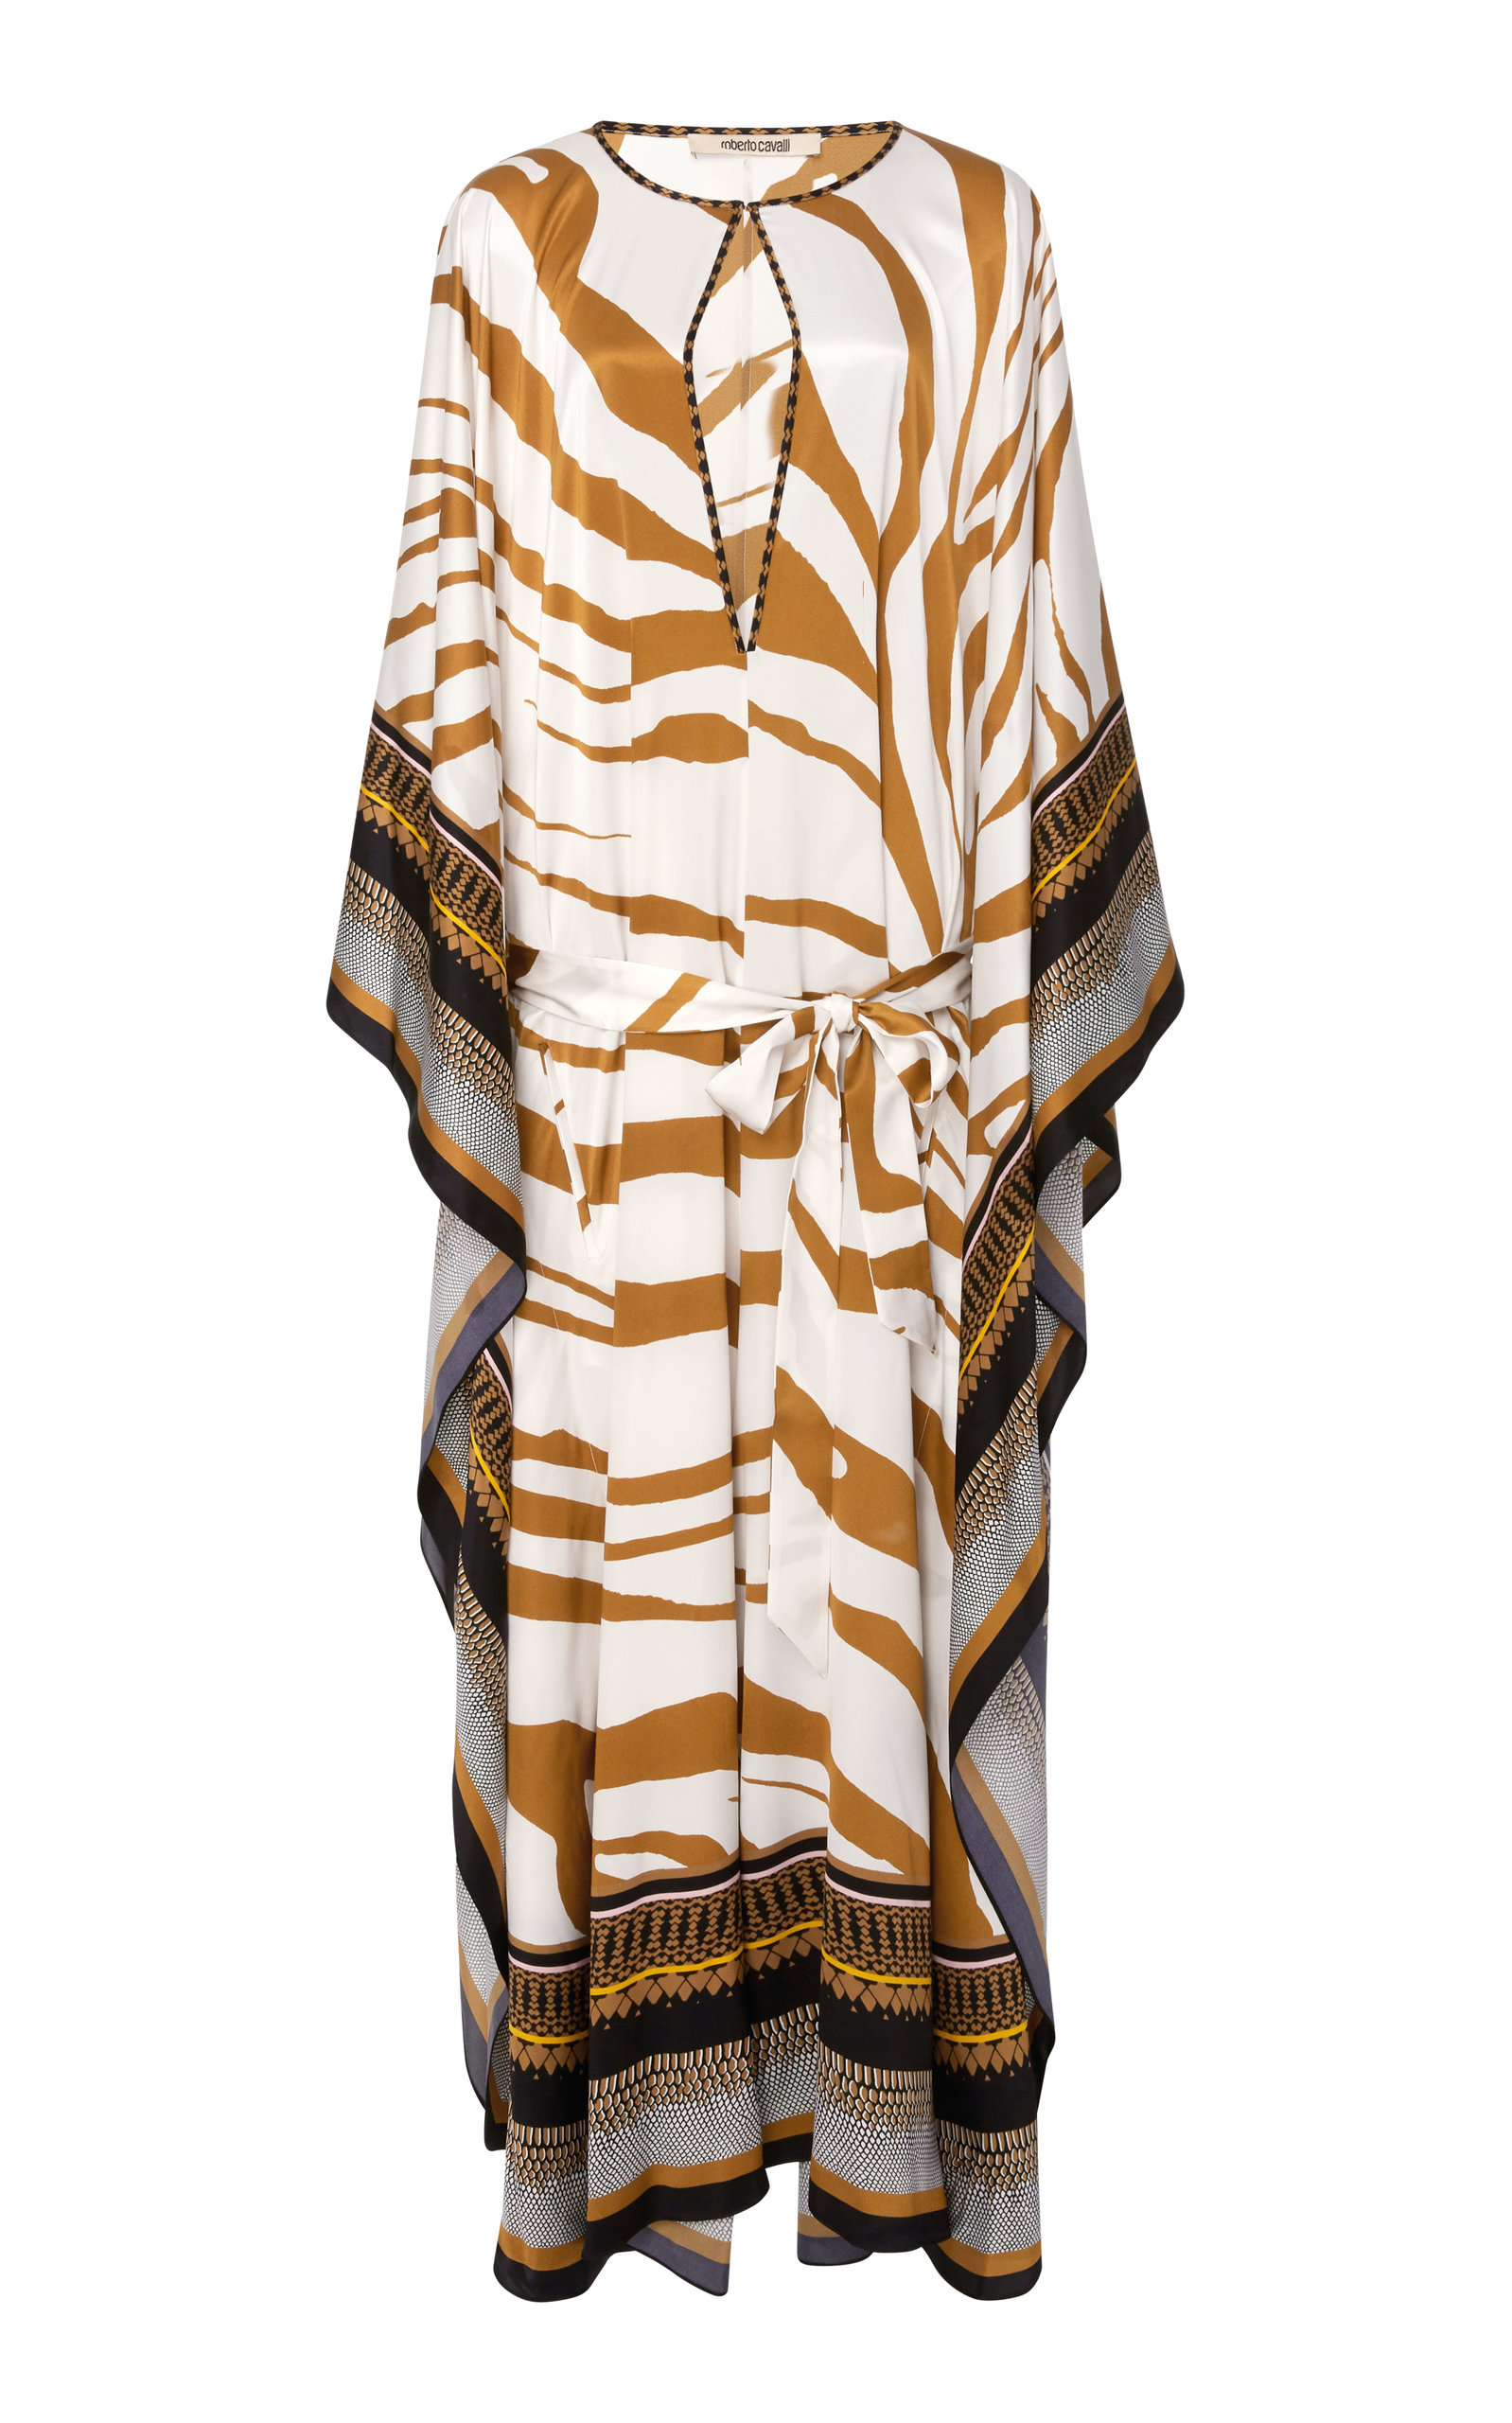 Cutout Printed Silk-Satin Kaftan Roberto Cavalli New Arrival Fashion iCPbkz